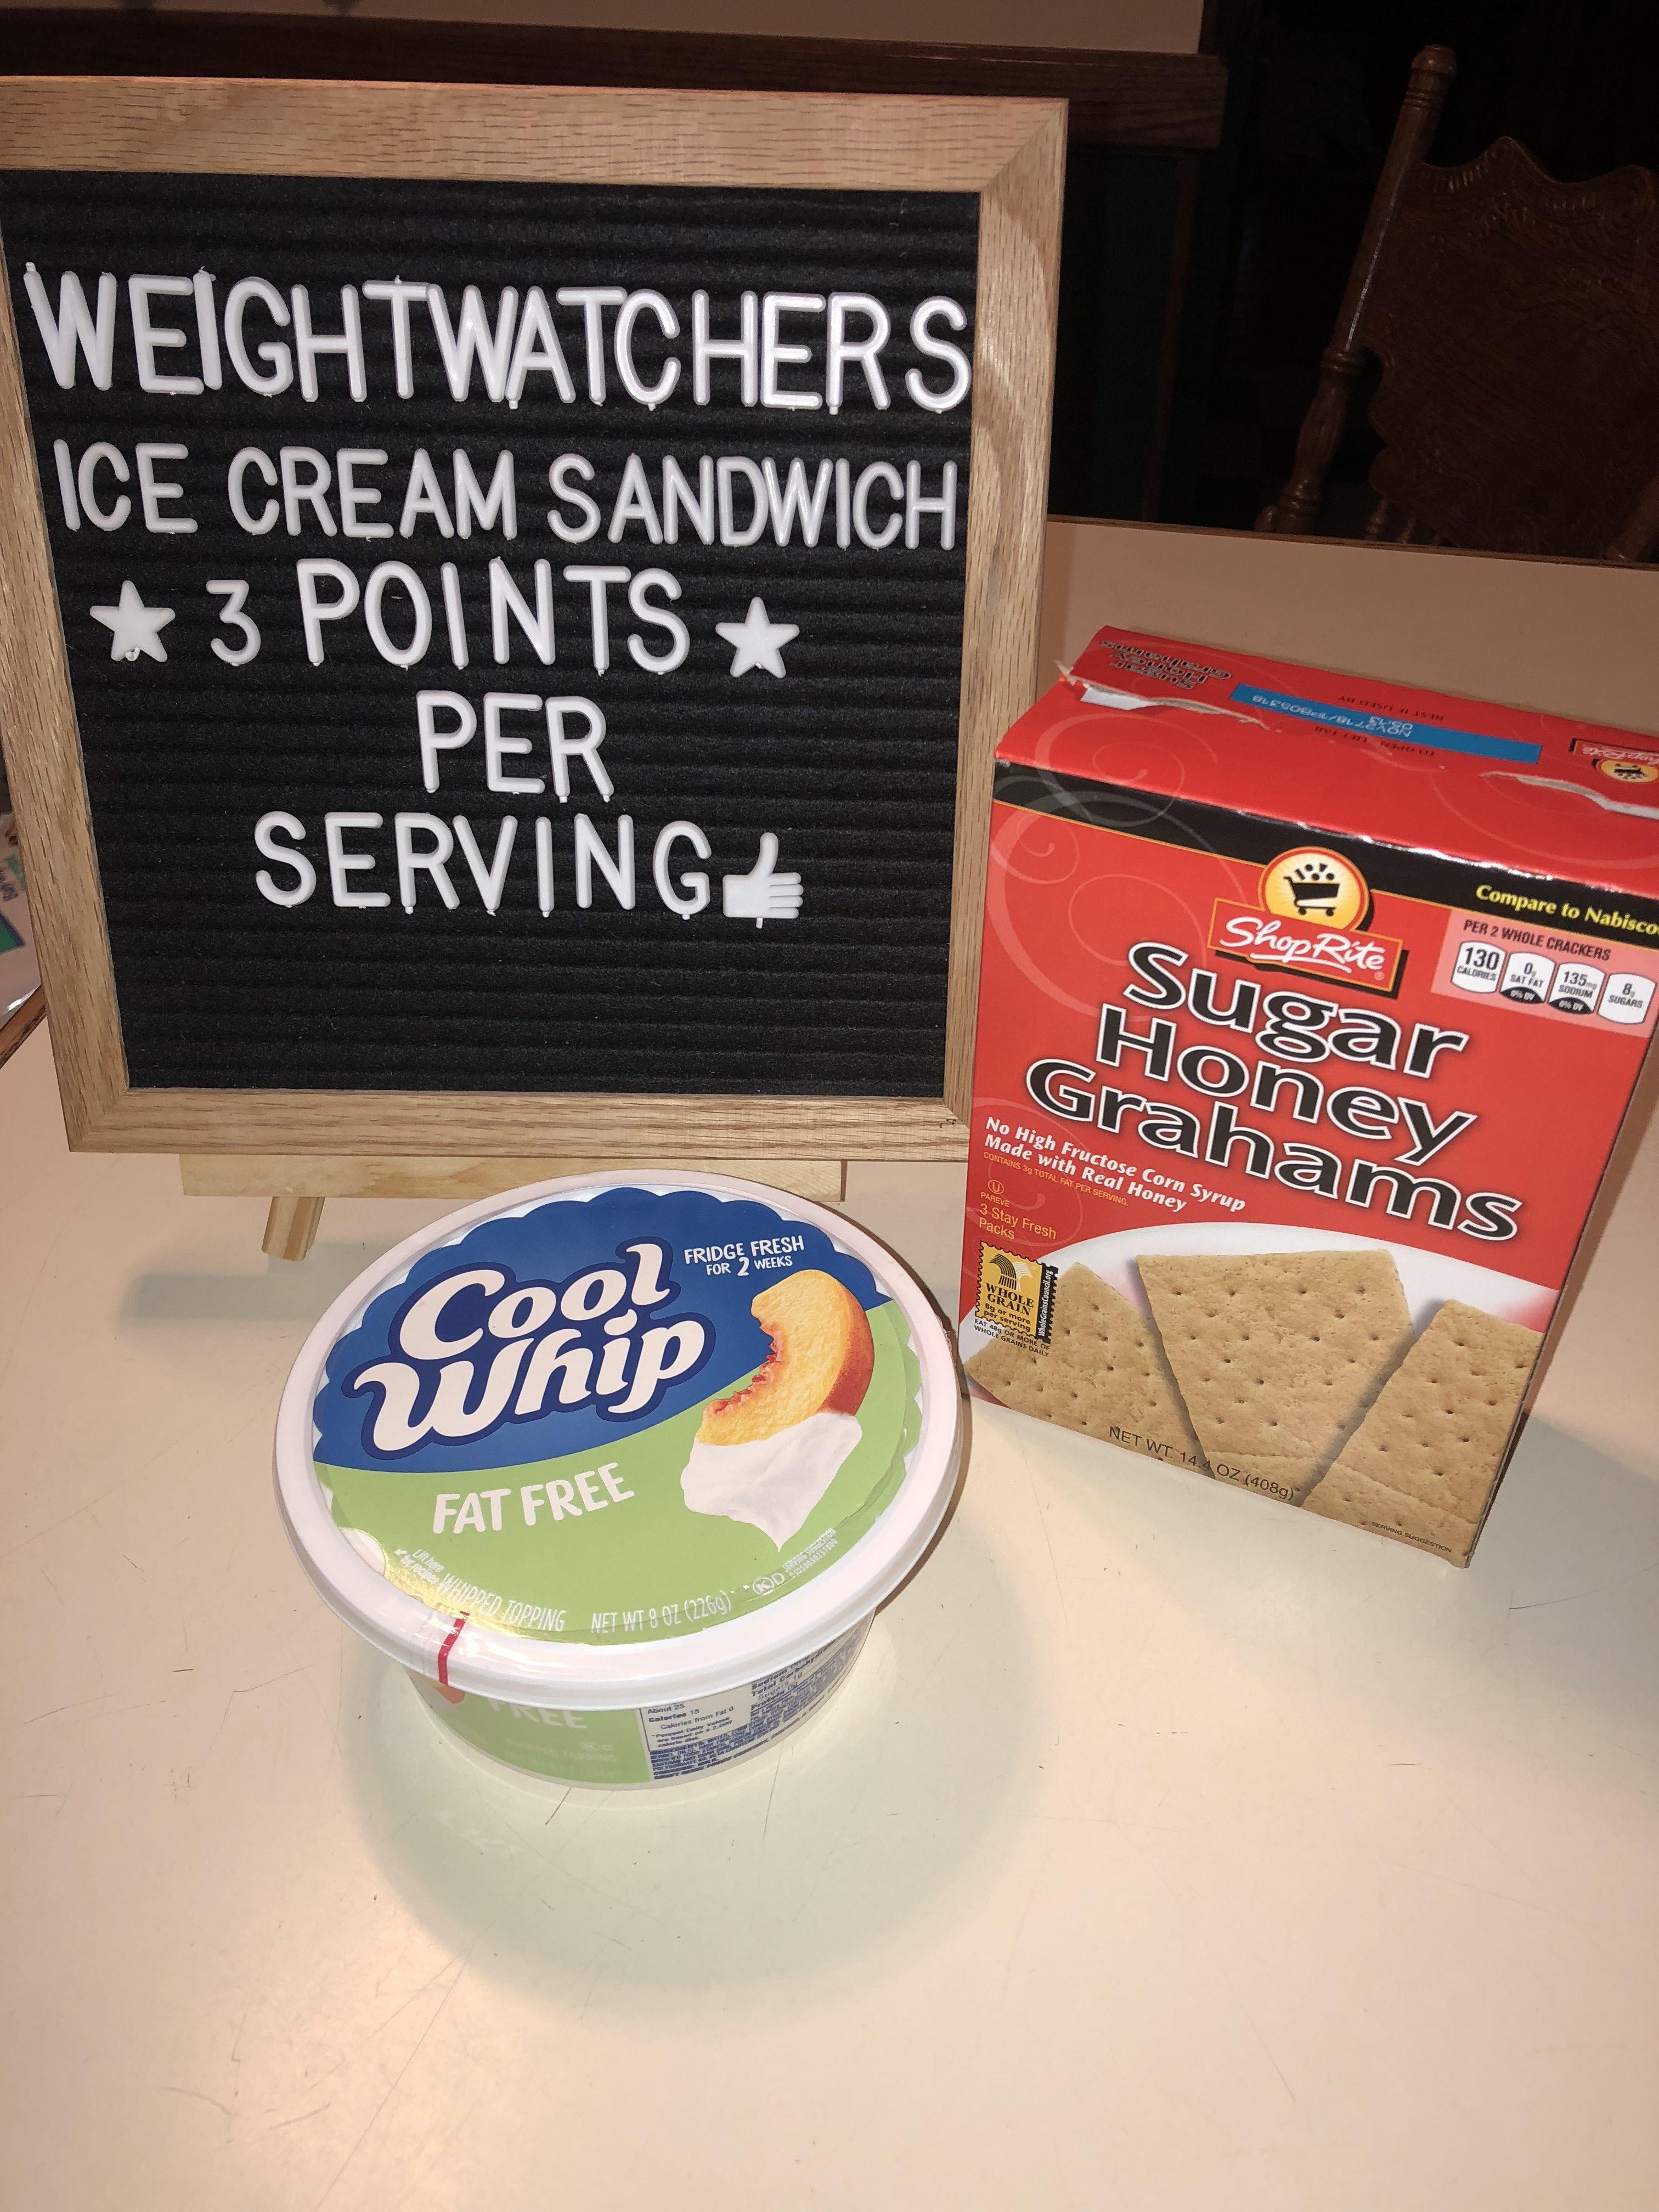 Weight Watchers Faux Ice Cream Sandwich Recipe - Just 3 Smart Points per sandwich